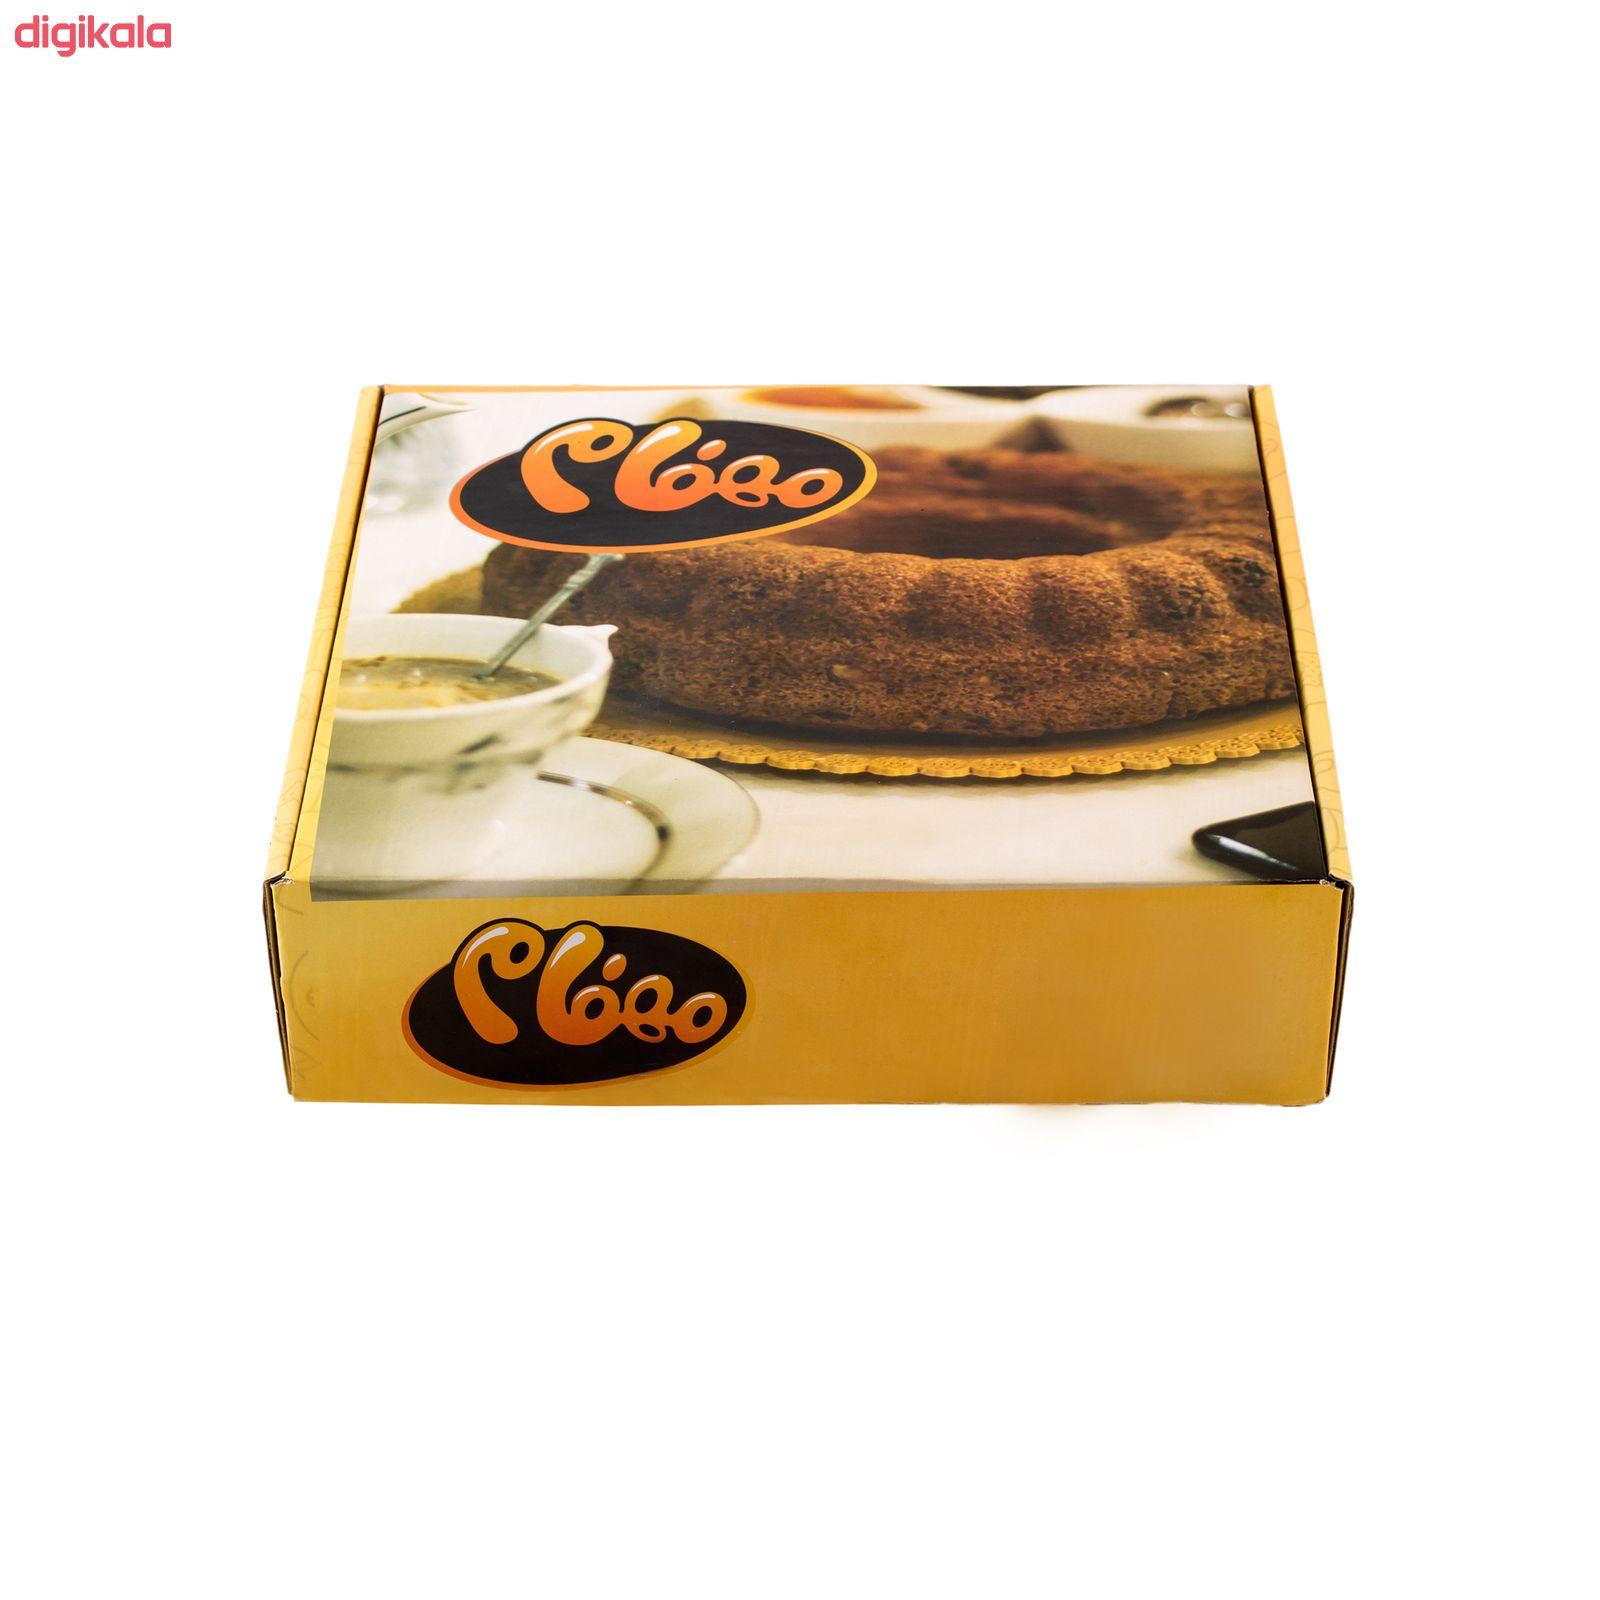 کیک روغنی هویج گردو مهفام - 620 گرم  main 1 2